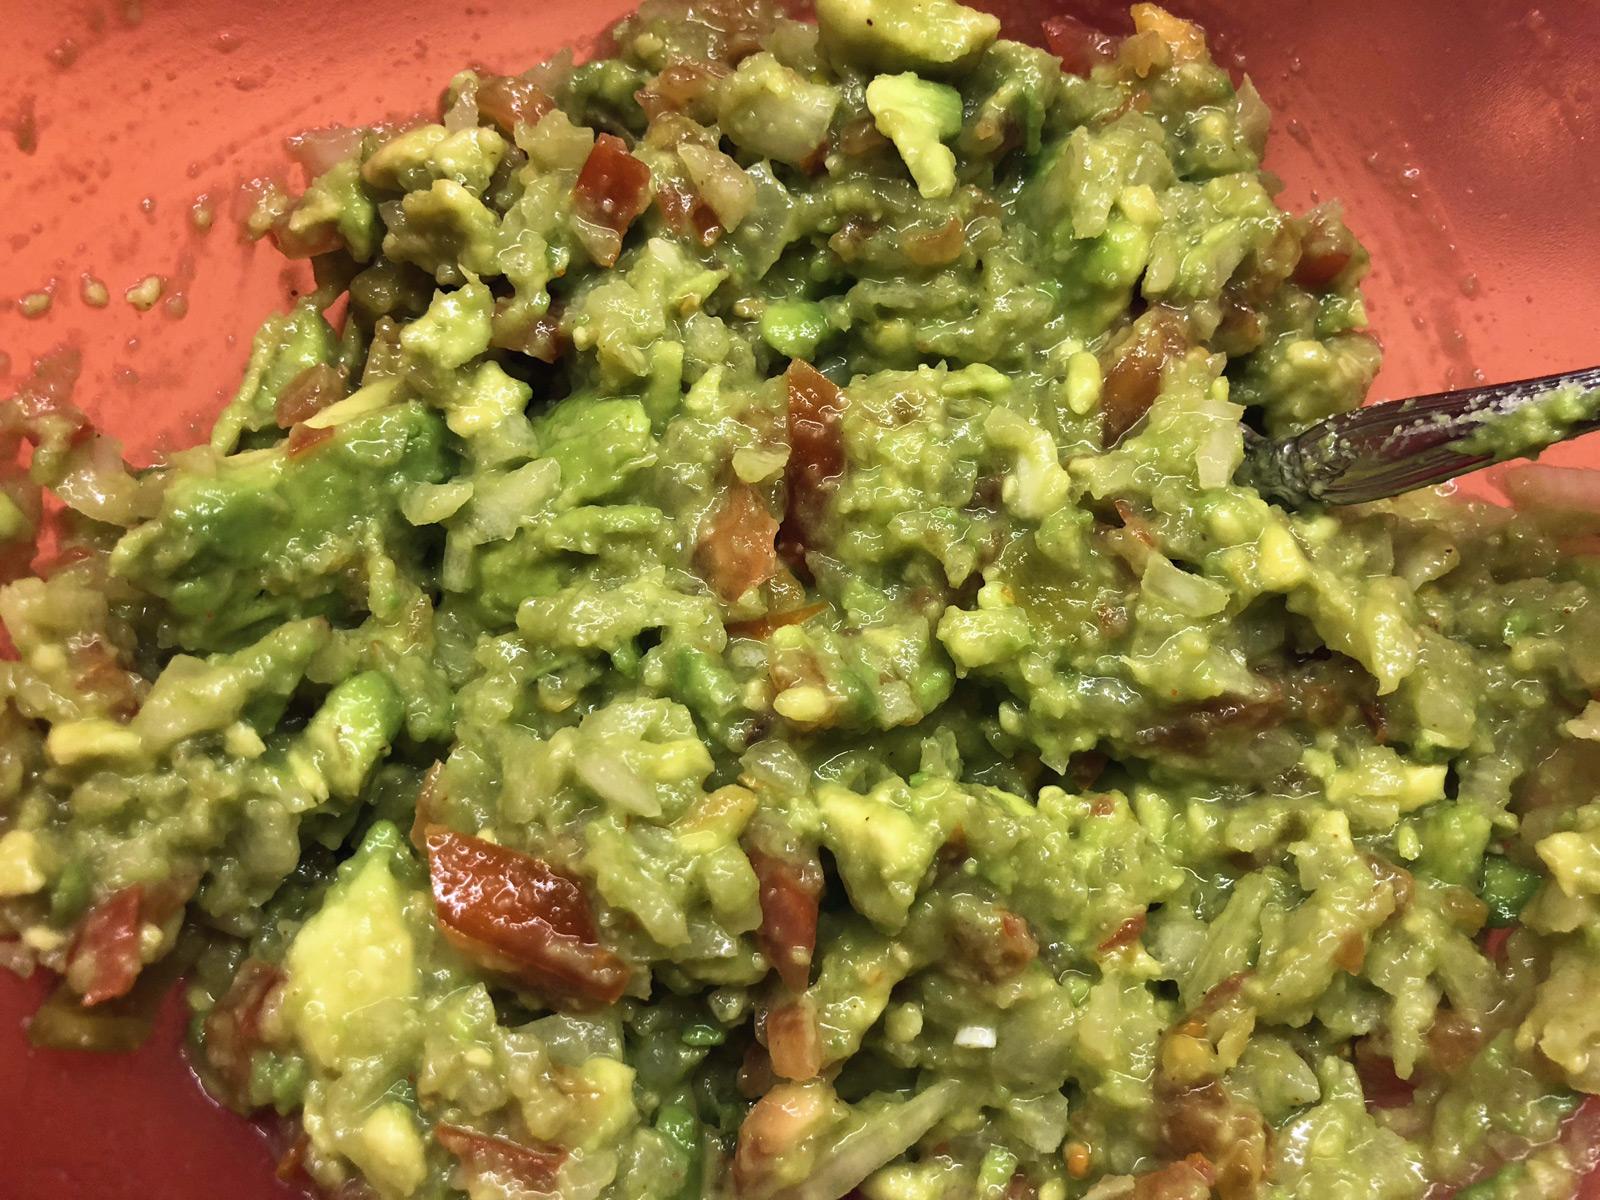 boris-karloff-guacamole.jpg